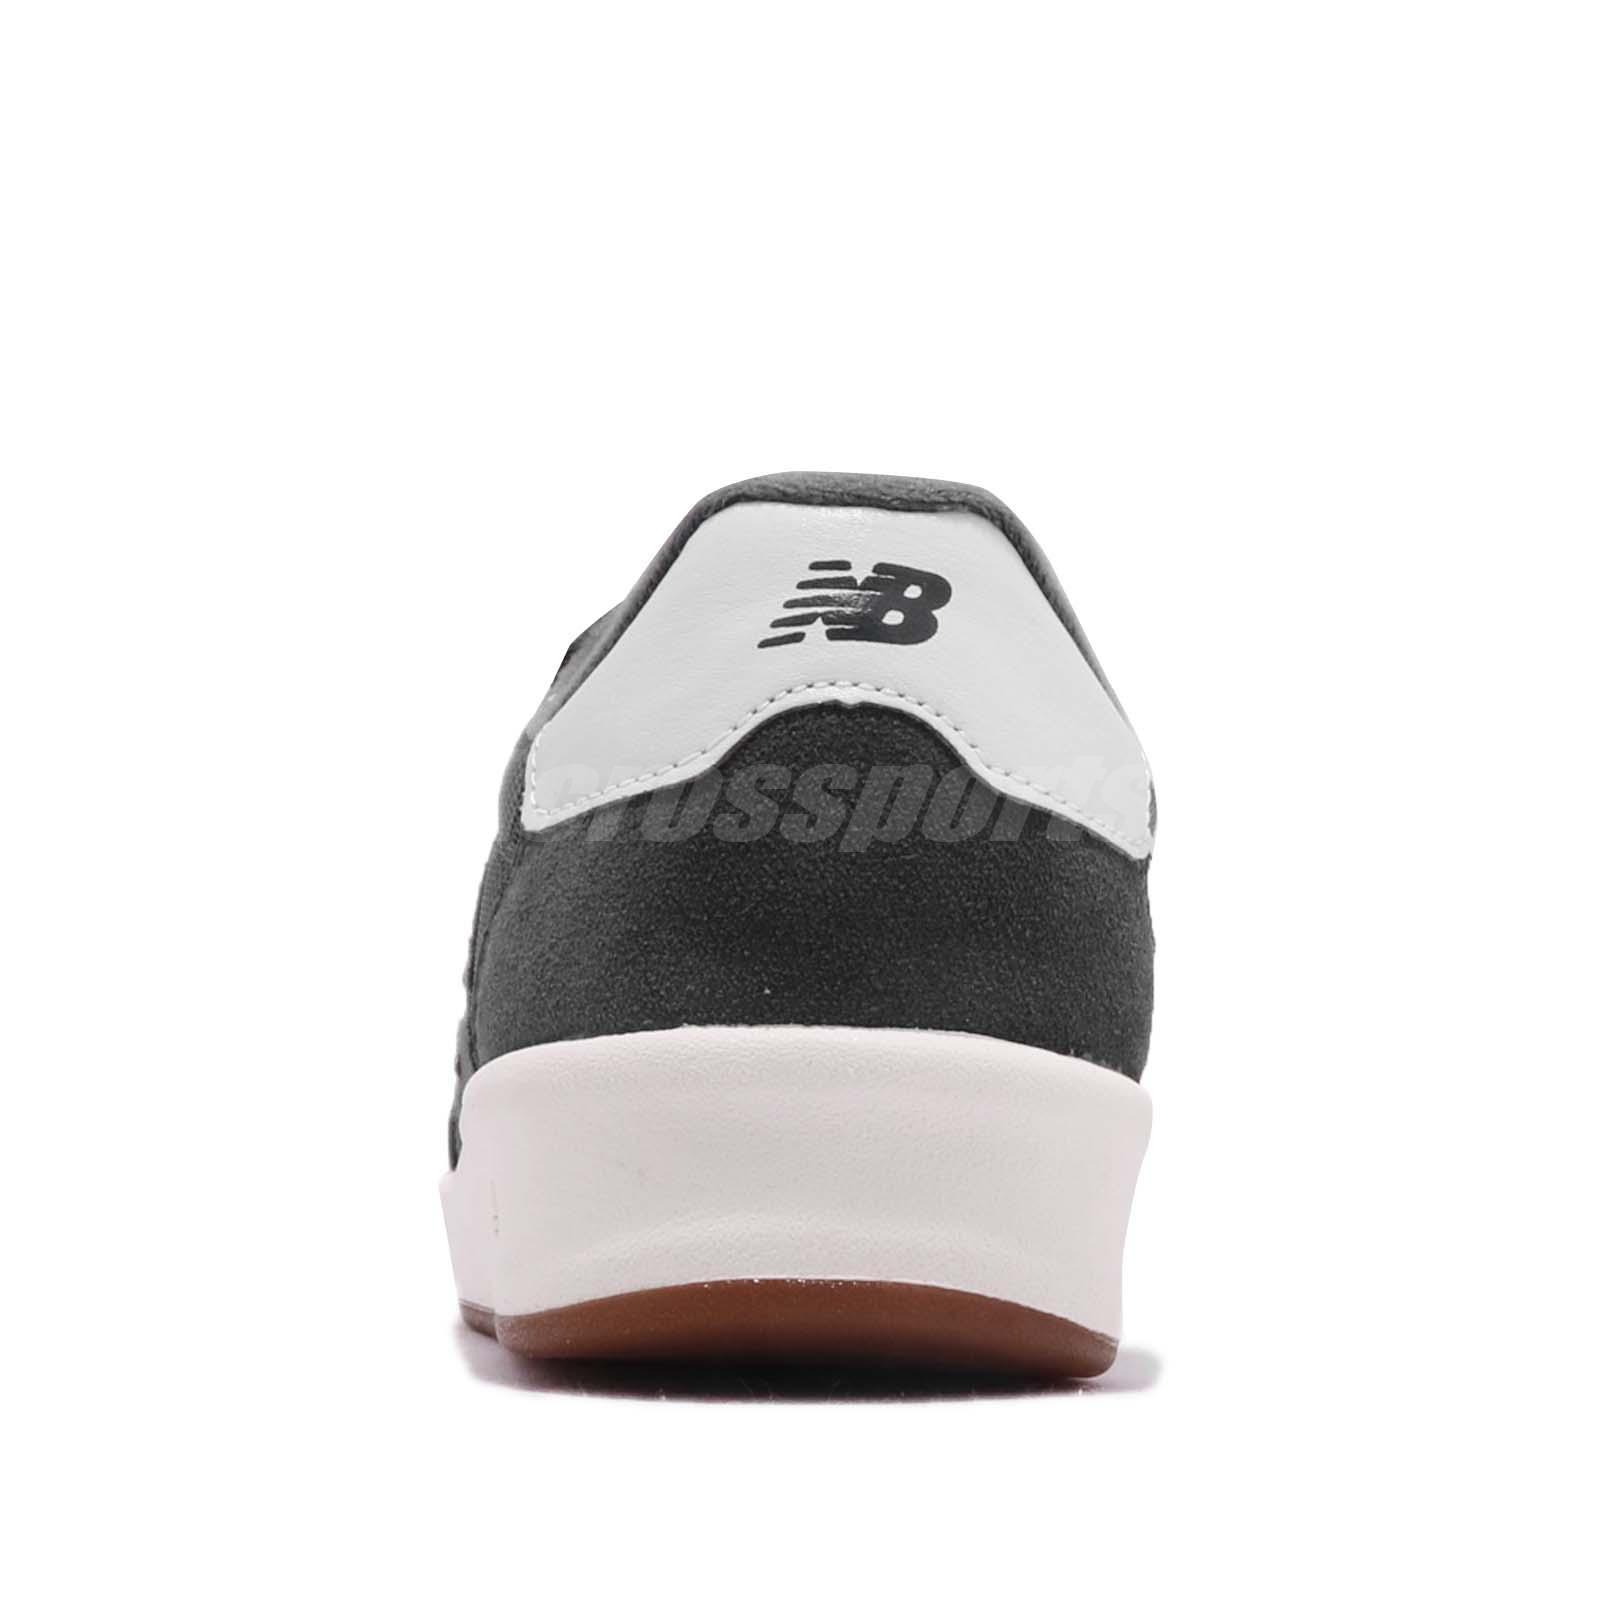 8d85d88c2c2 New Balance WRT300 Grey White Womens Lifestyle Casual Shoes WRT300FG ...